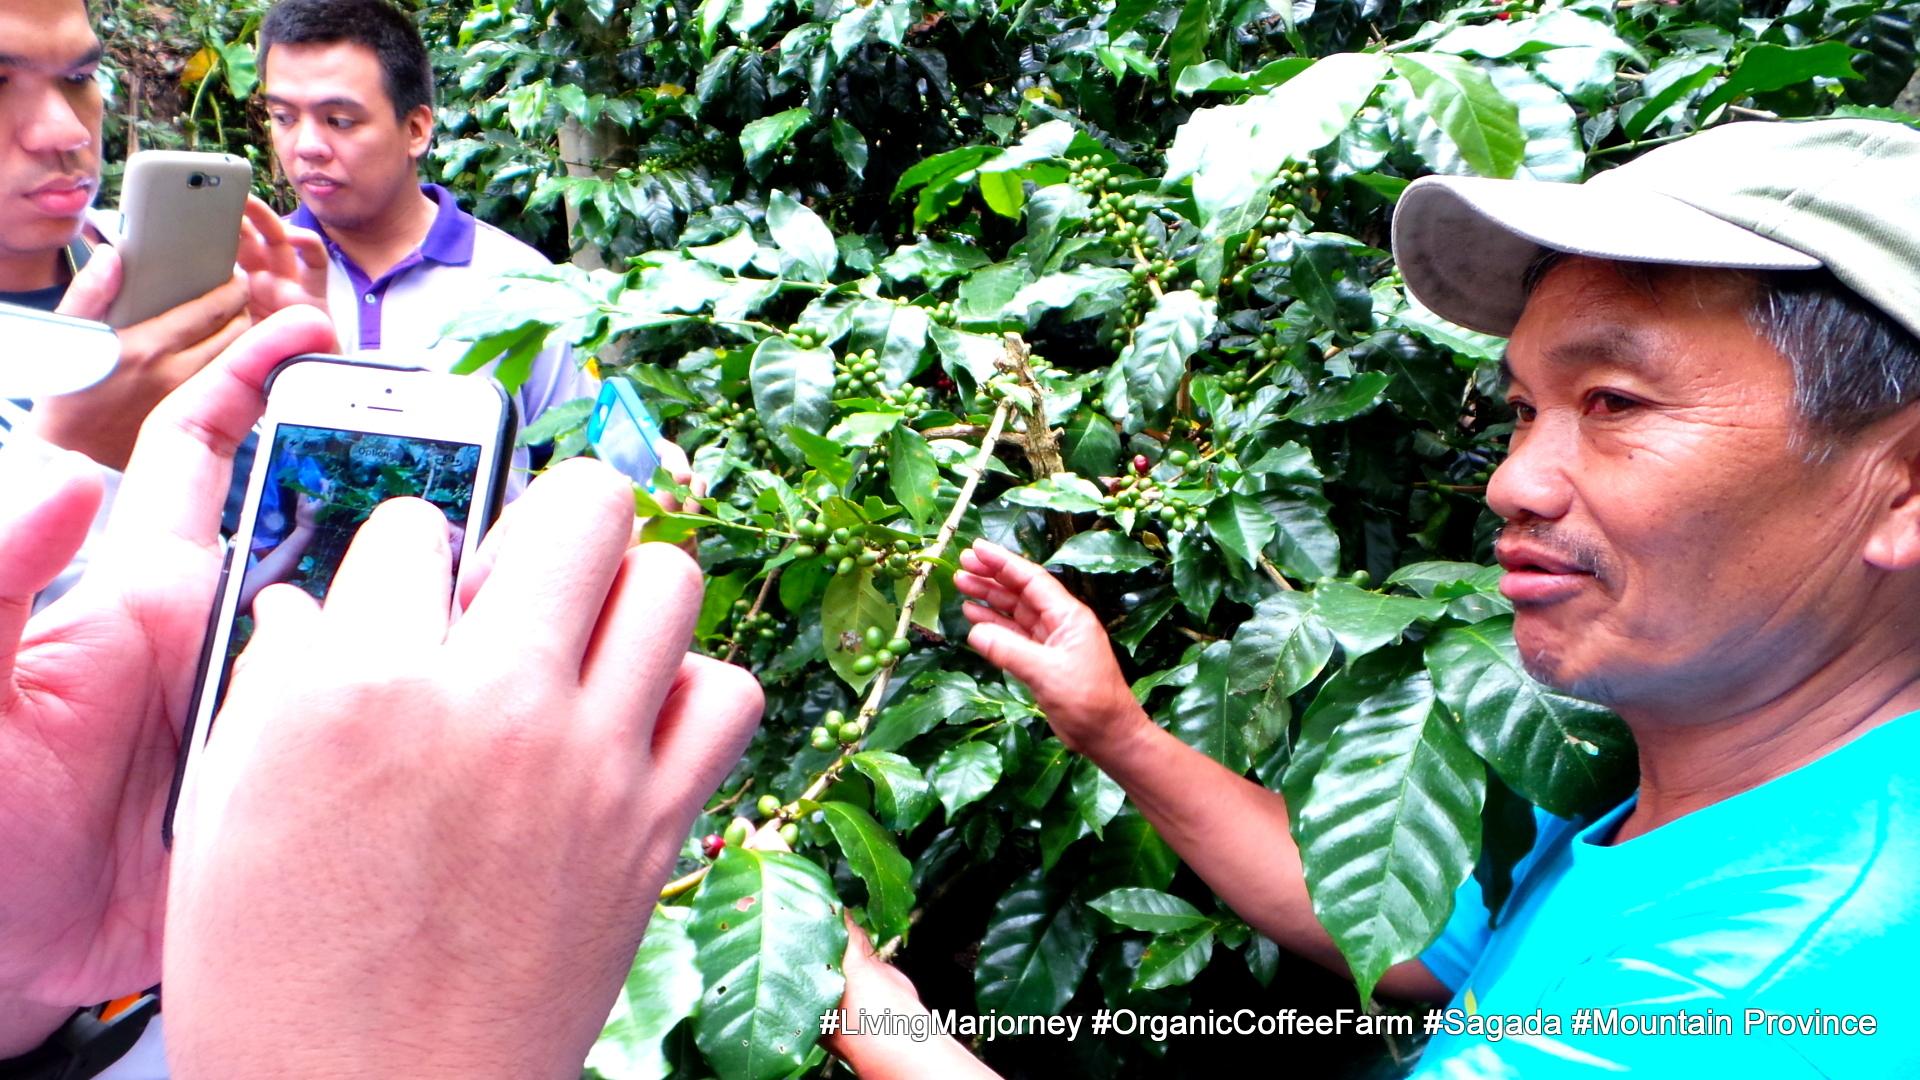 http://www.livingmarjorney.com/2013/08/sagada-organic-coffee-farm.html